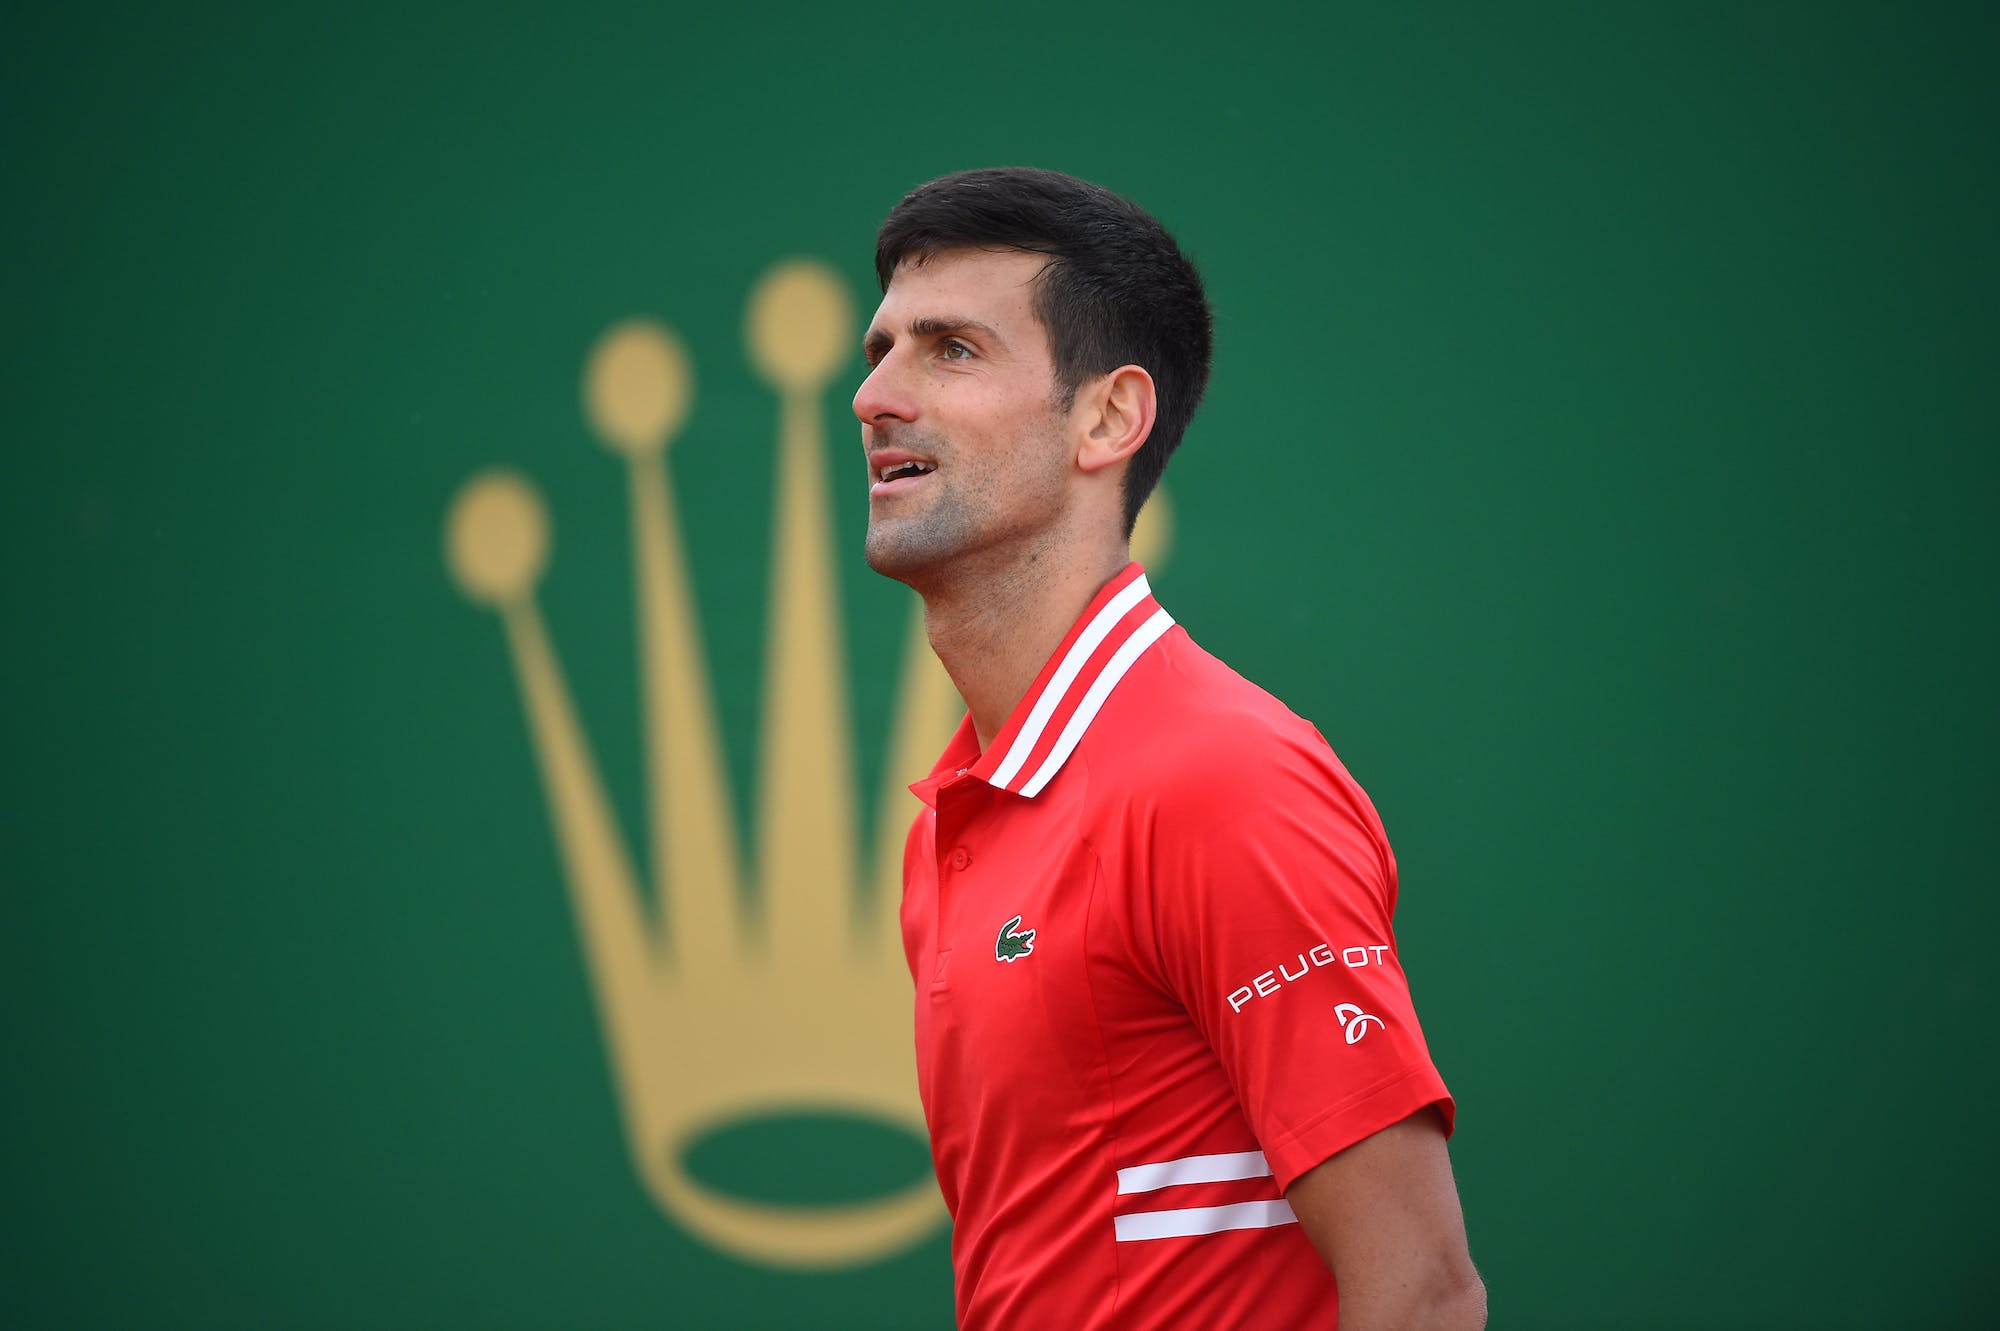 Novak Djokovic Monte-Carlo 2021